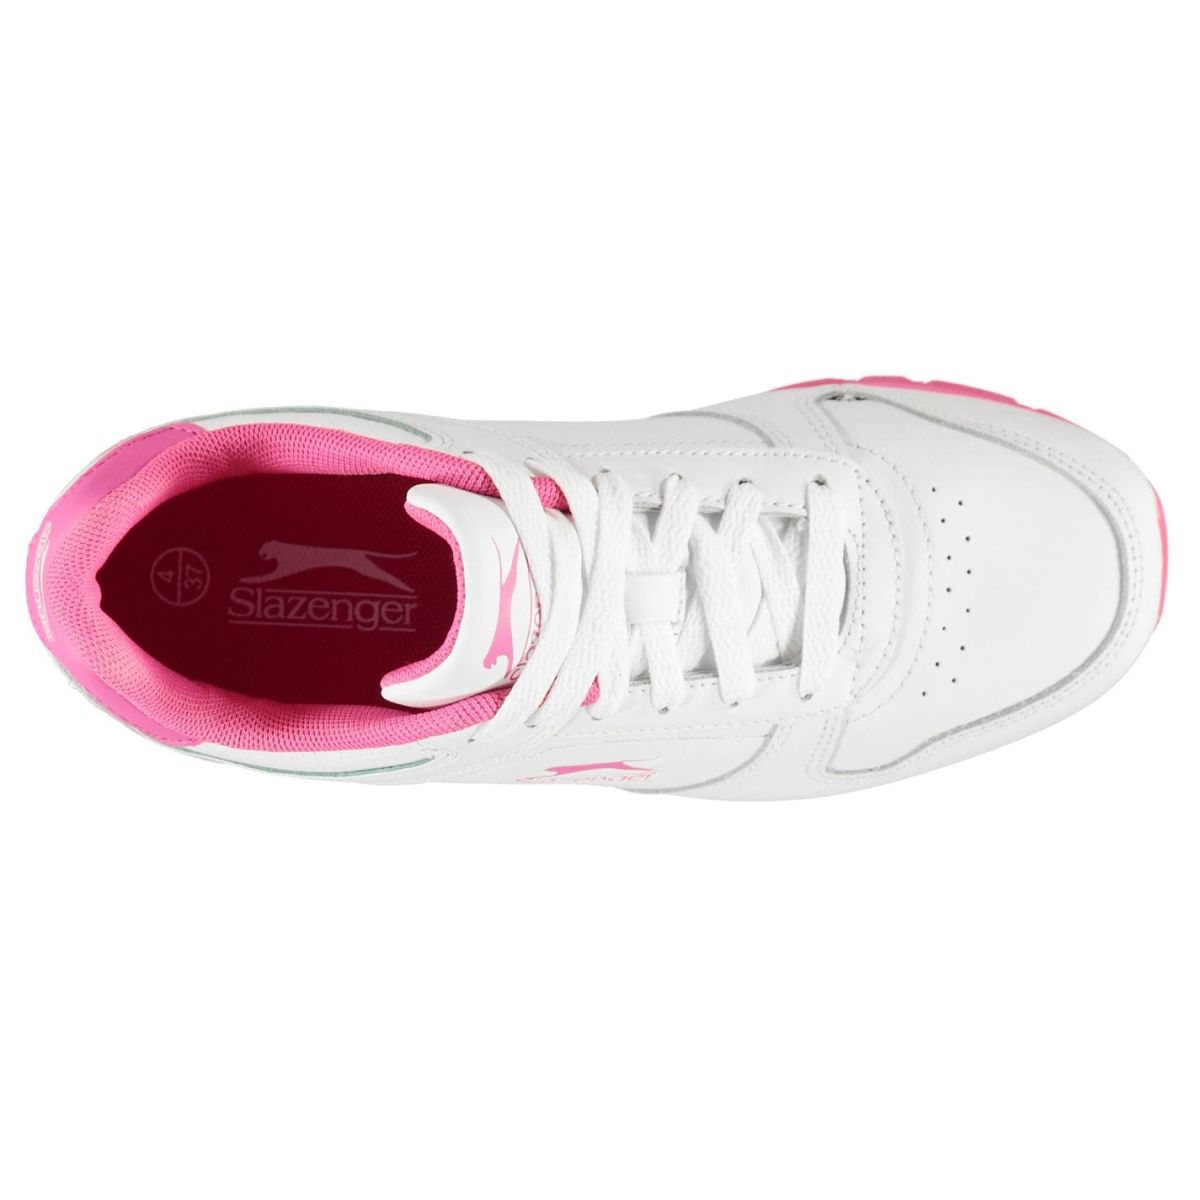 Slazenger-Classic-Turnschuhe-Laufschuhe-Damen-Sportschuhe-Sneaker-1265 Indexbild 17